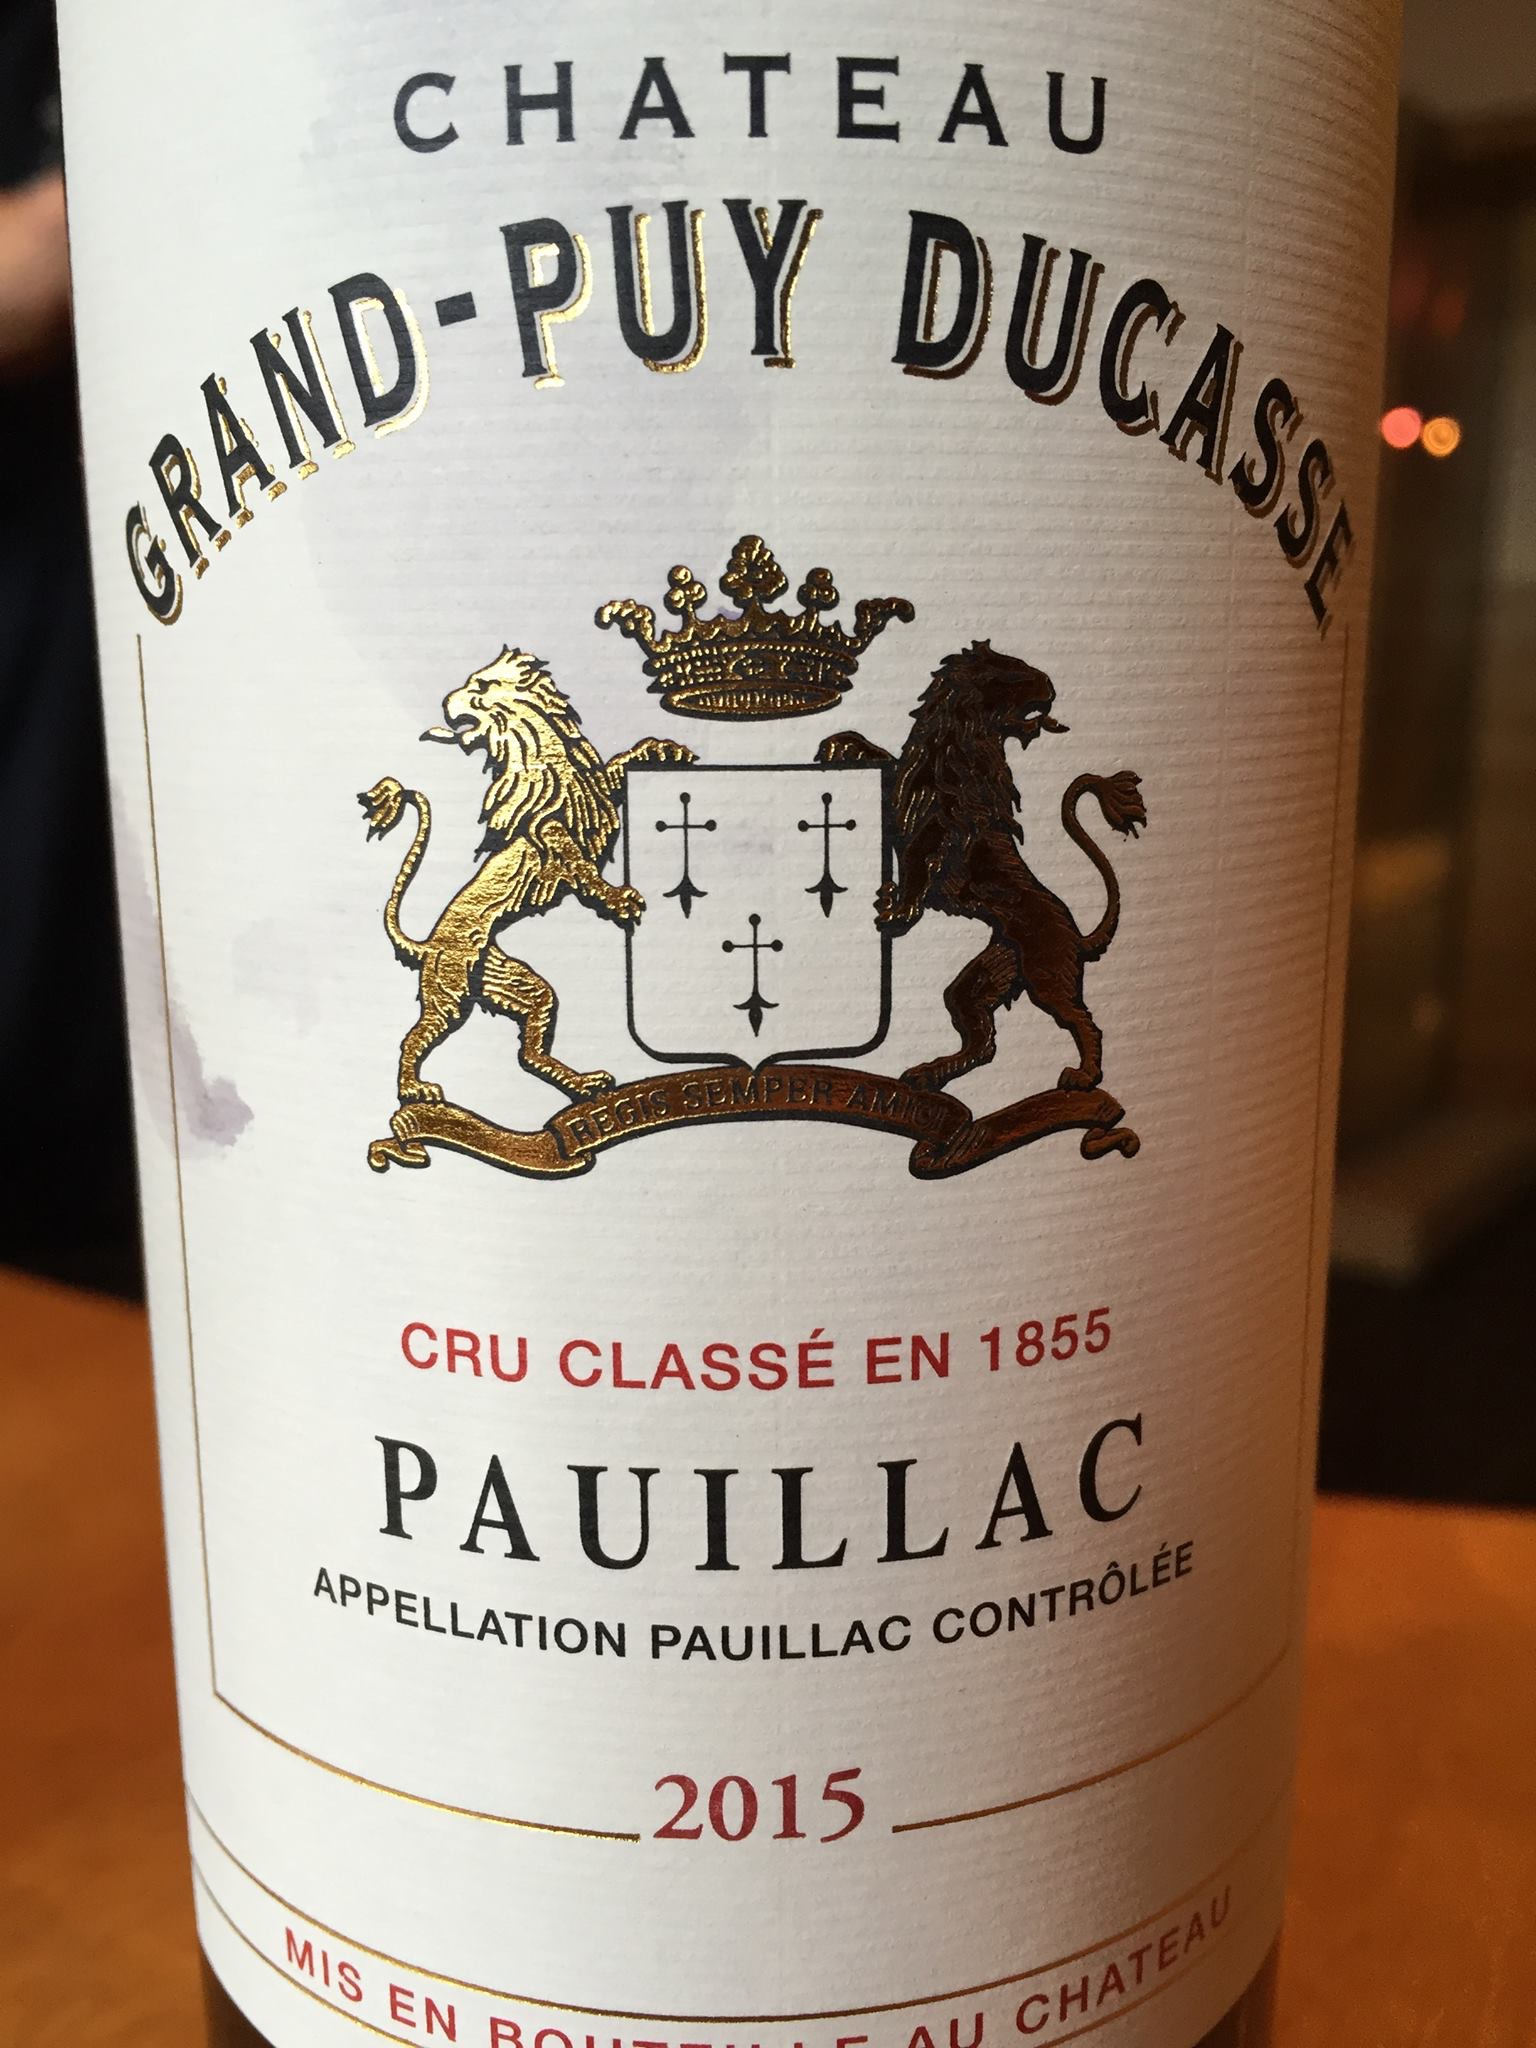 Château Grand Puy Ducasse 2015 – Pauillac, 5ème Cru Classé